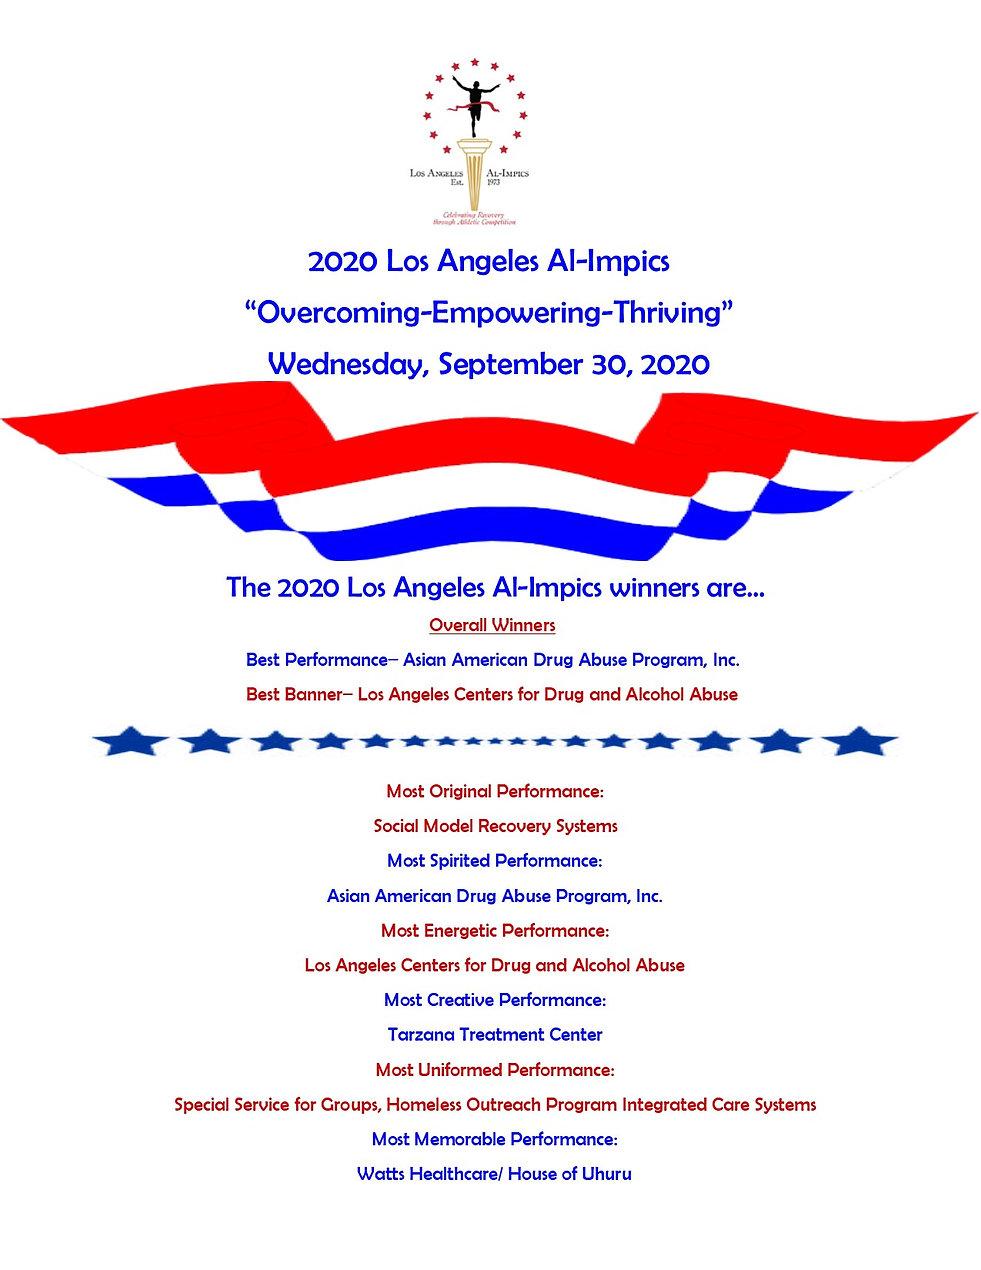 Al-Impics Winners_2020.jpg